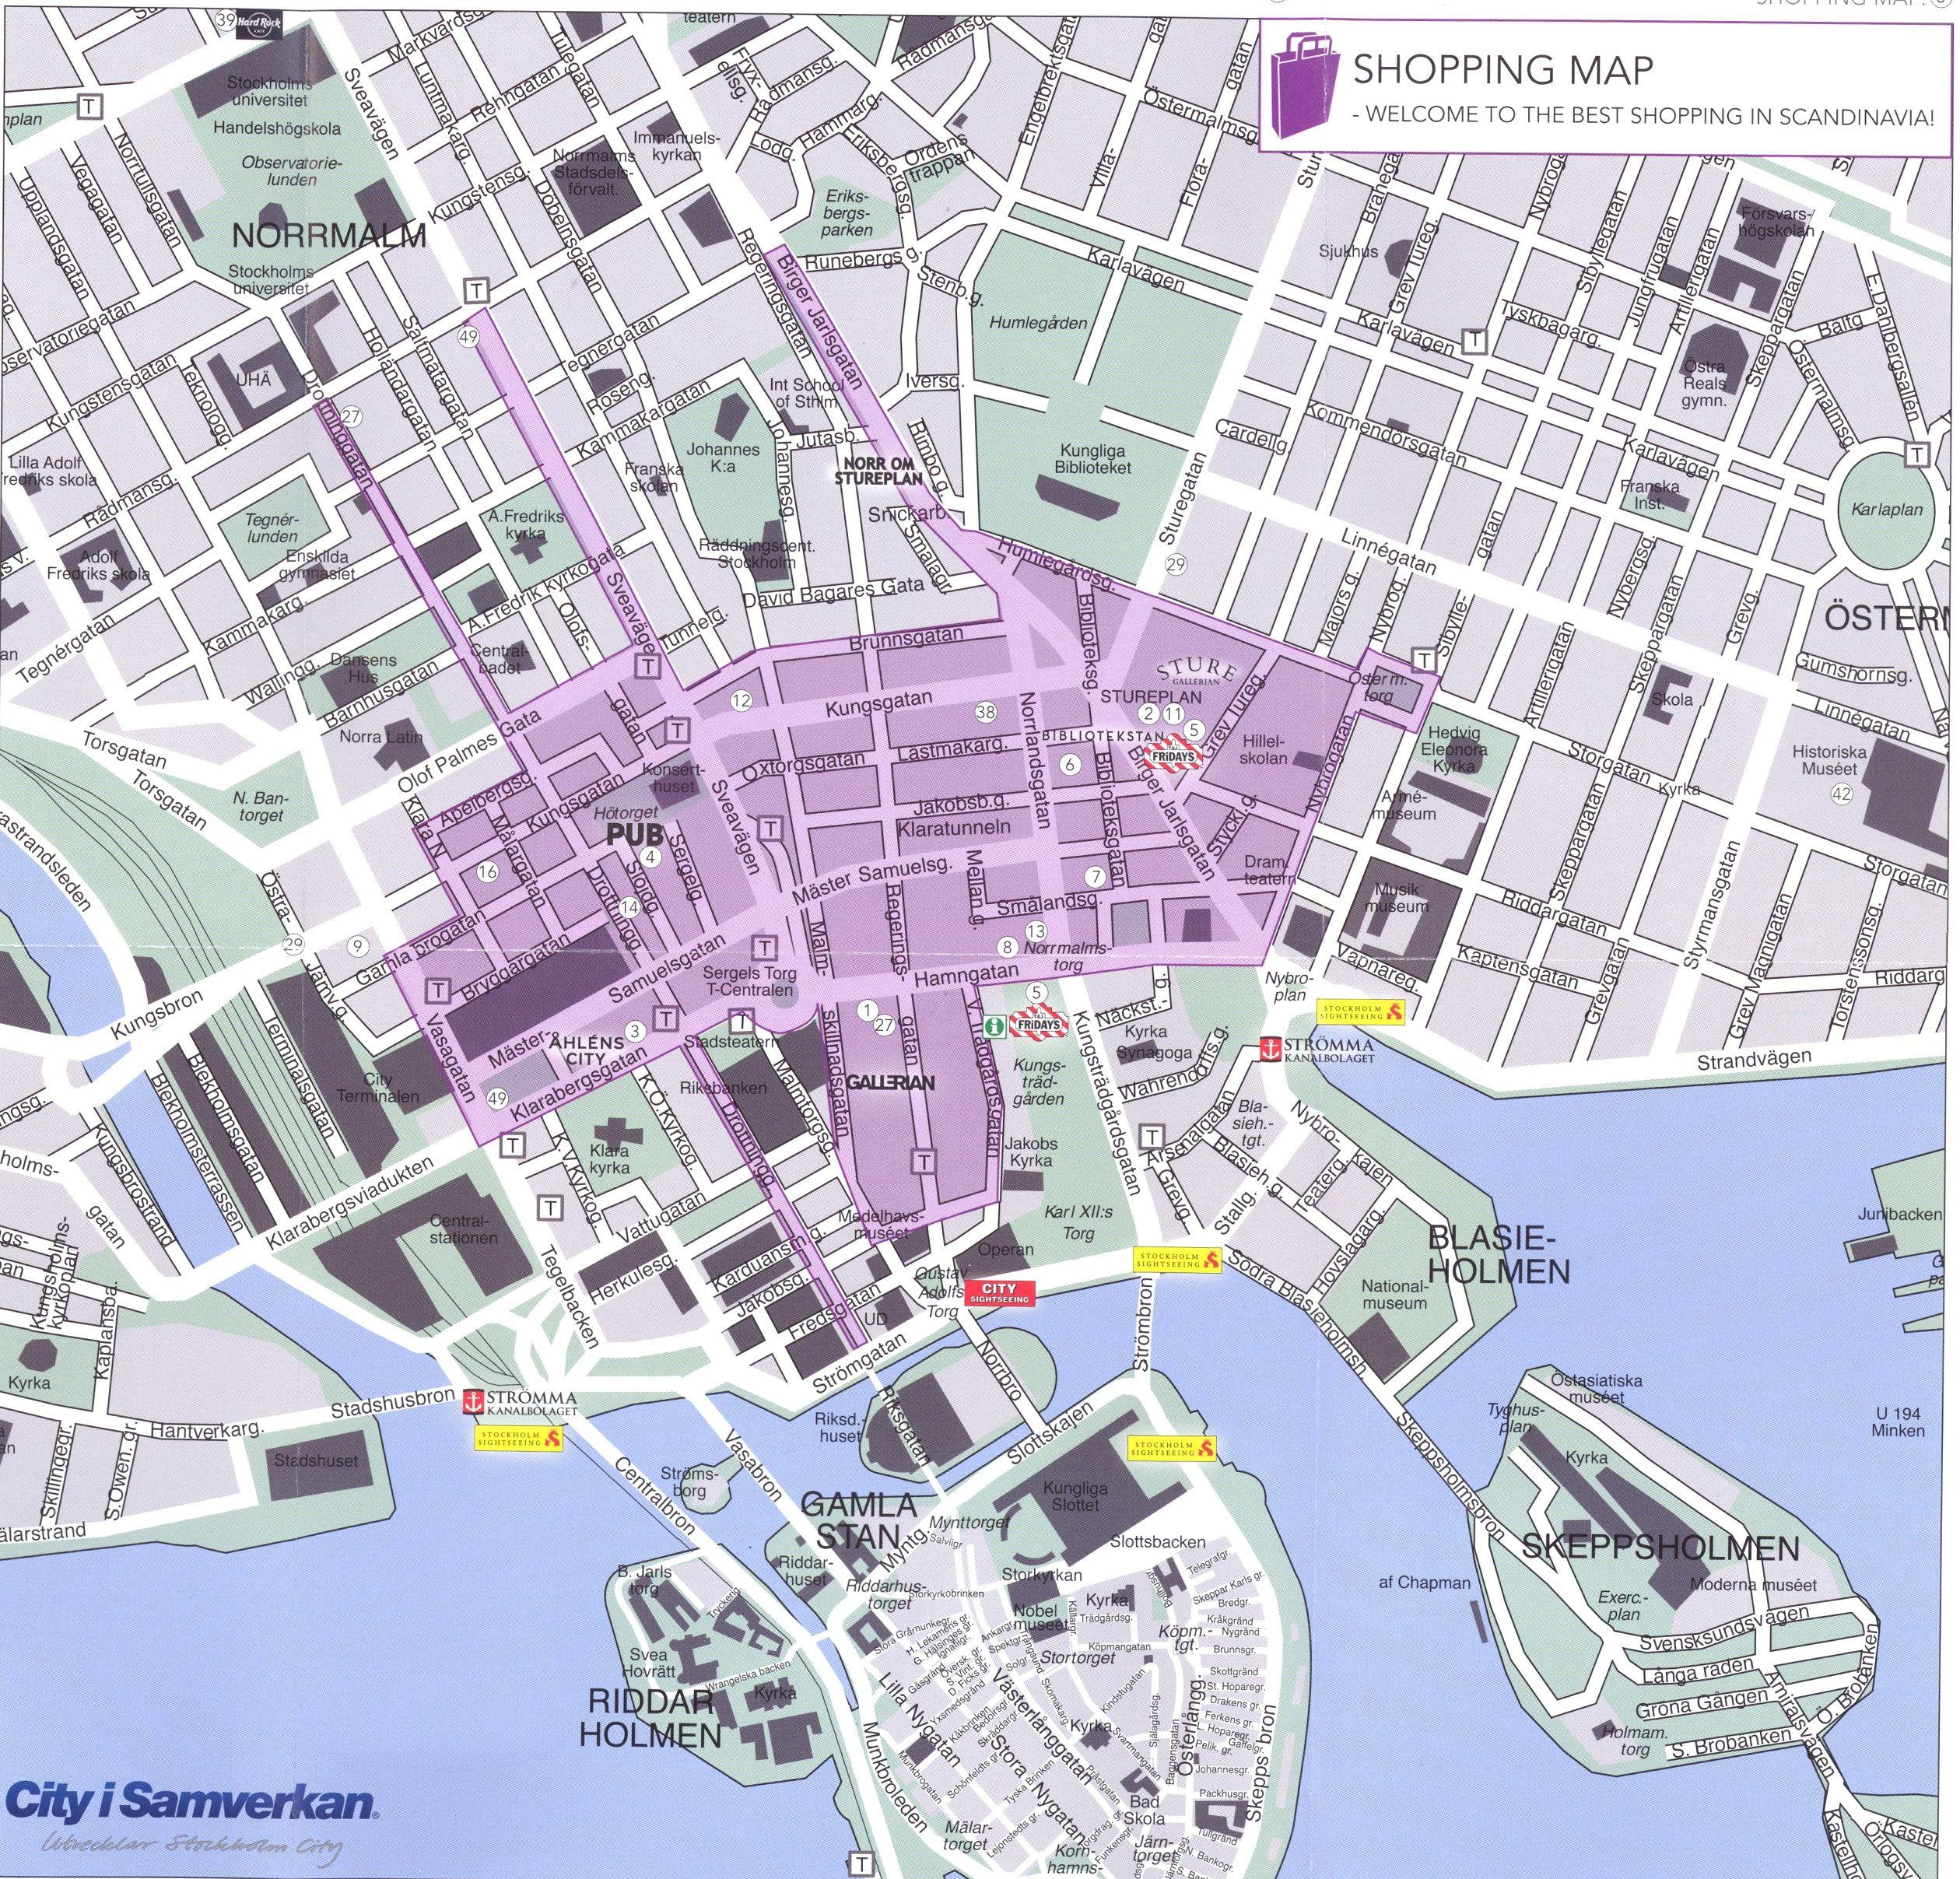 Stockholm Shopping Map Stockholm Mappery Stockholm Shopping